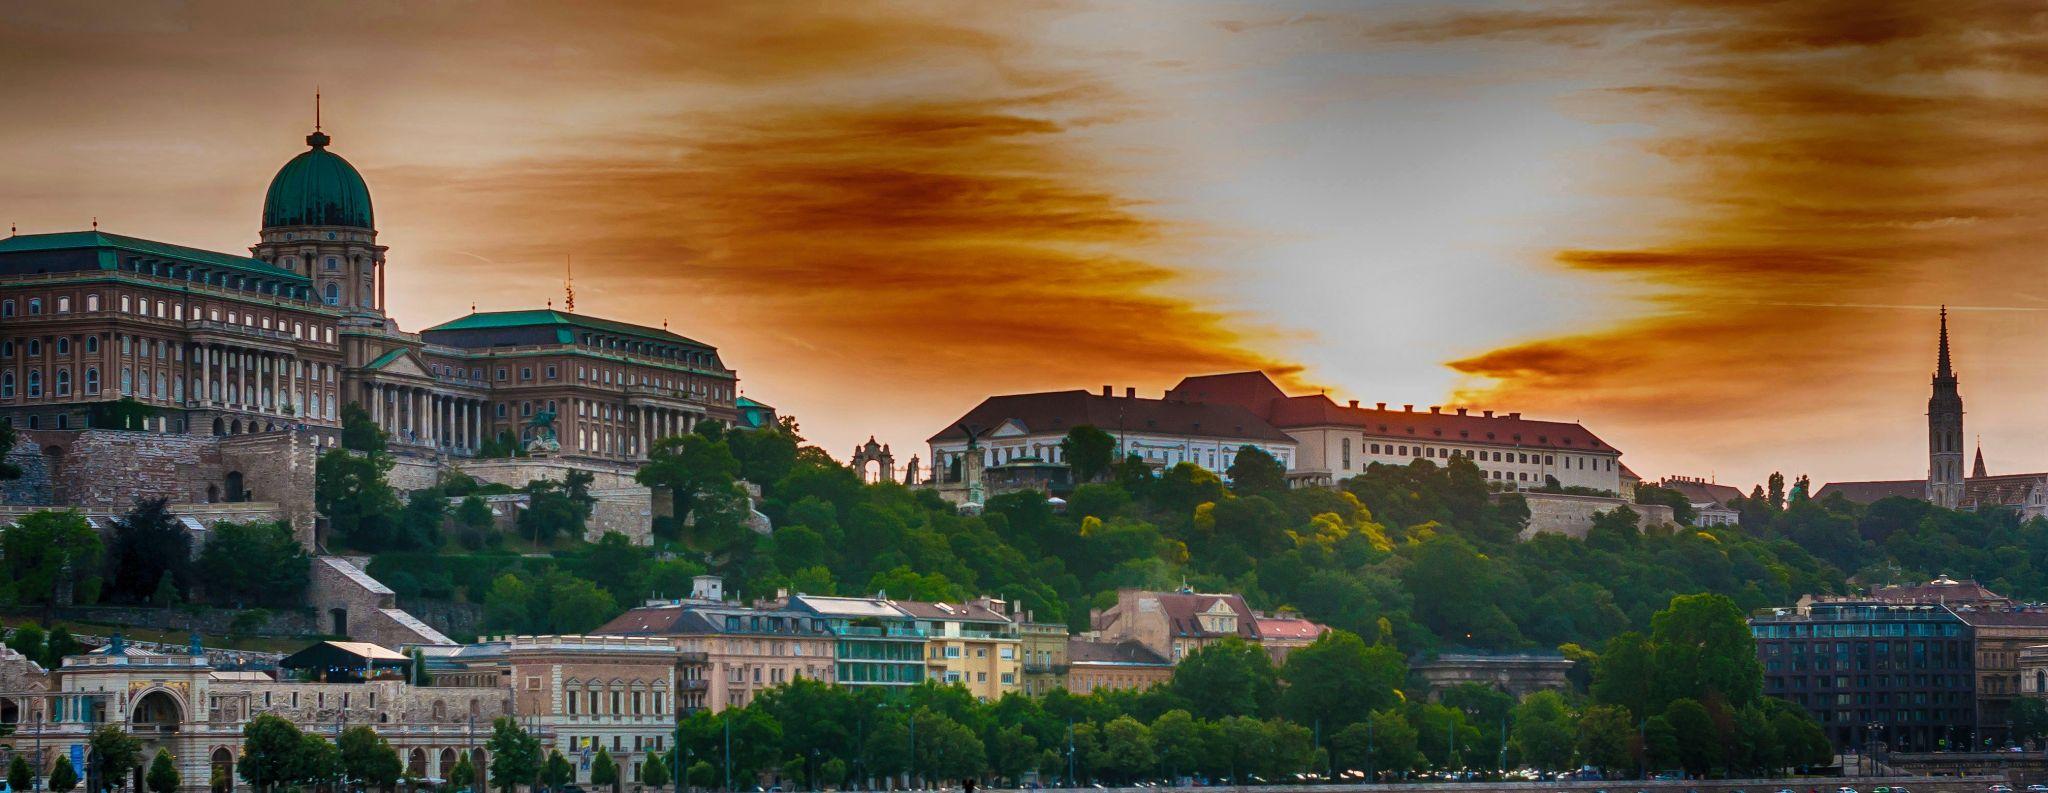 Sunset over the Royal Palace, Hungary